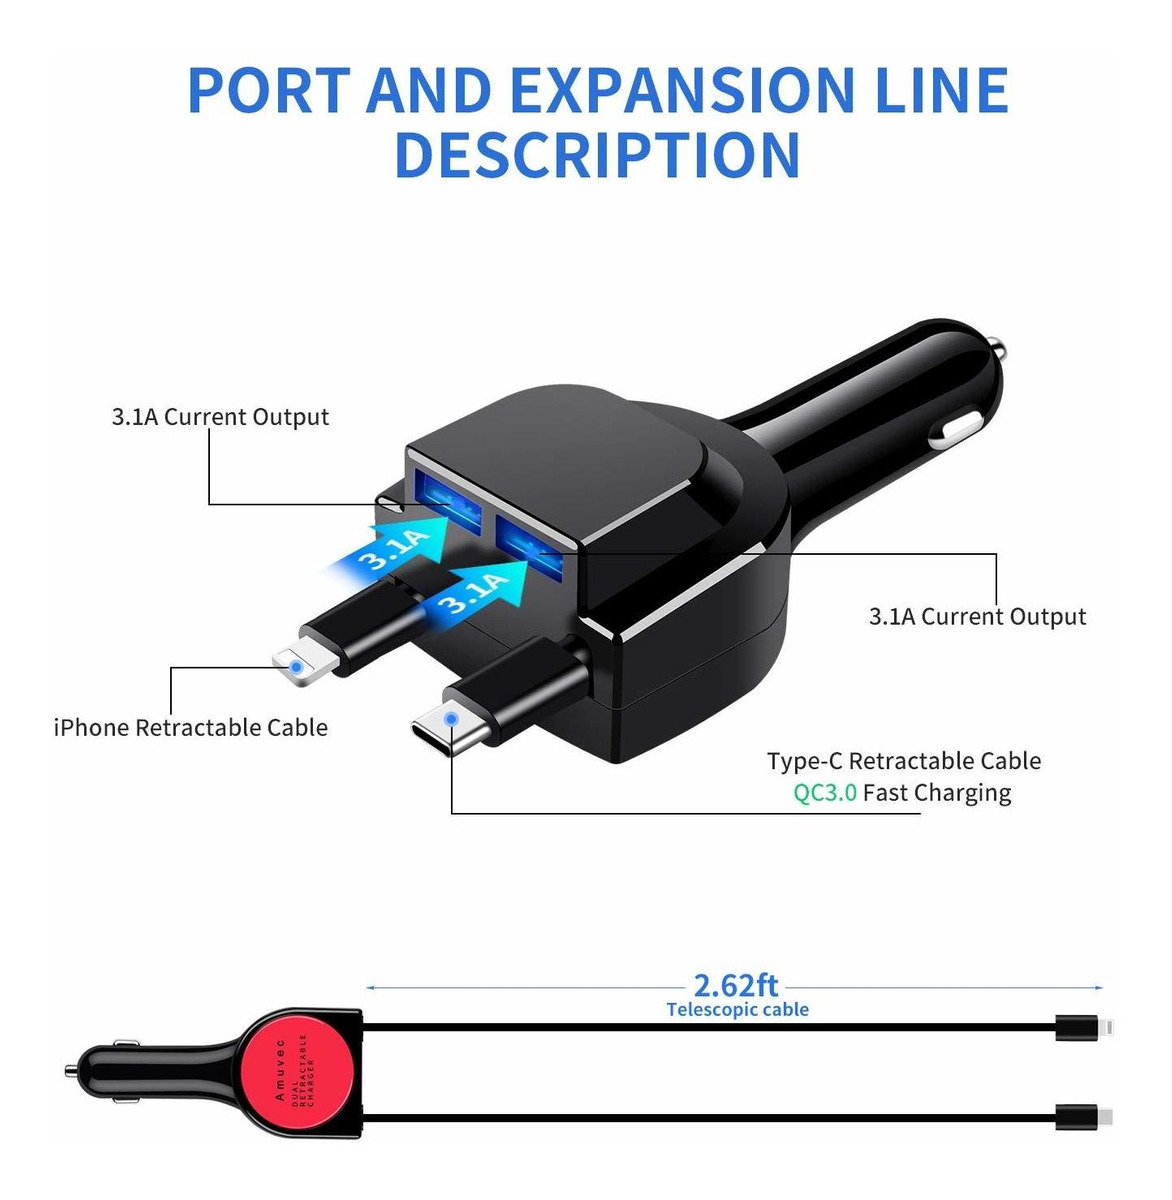 ,QC3.0 Multi Adaptador con iP/&Tipo-C Cable Retr/áctil,Carga R/ápida para Phone X 8 Samsung Galaxy S10//S9//S8,LG G5//G6,Huawei P20//Mate10,Xiaomi y M/ás Amuvec Cargador de Coche con Doble Puerto USB 6A//40W